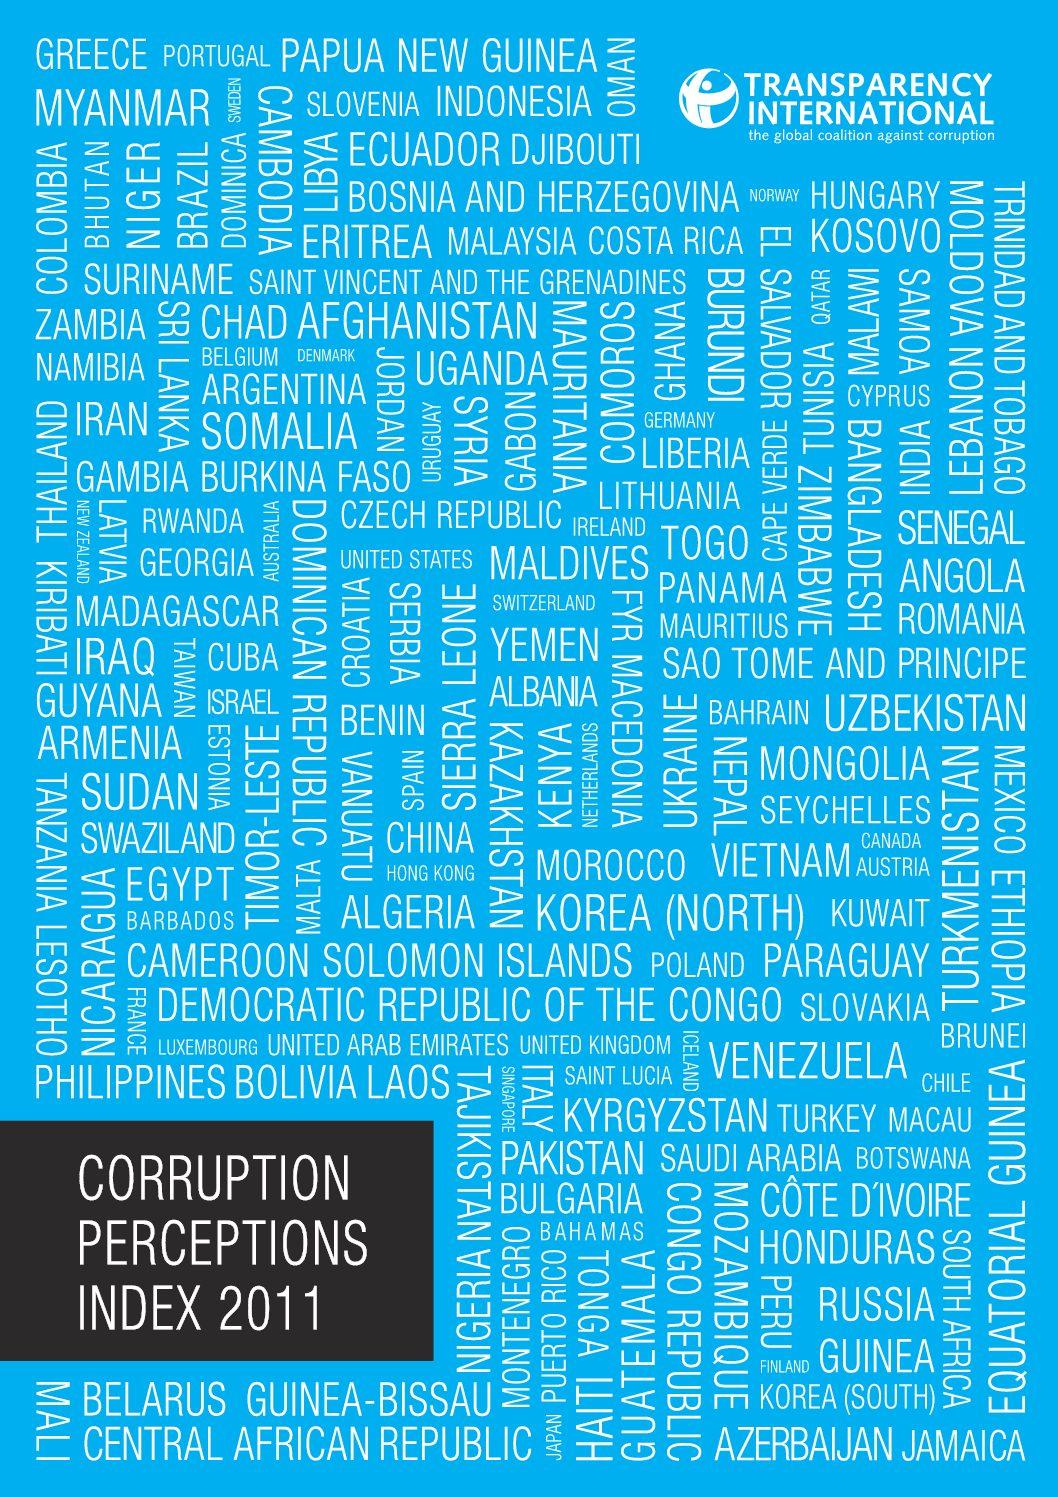 Corruption Perception Index 2011